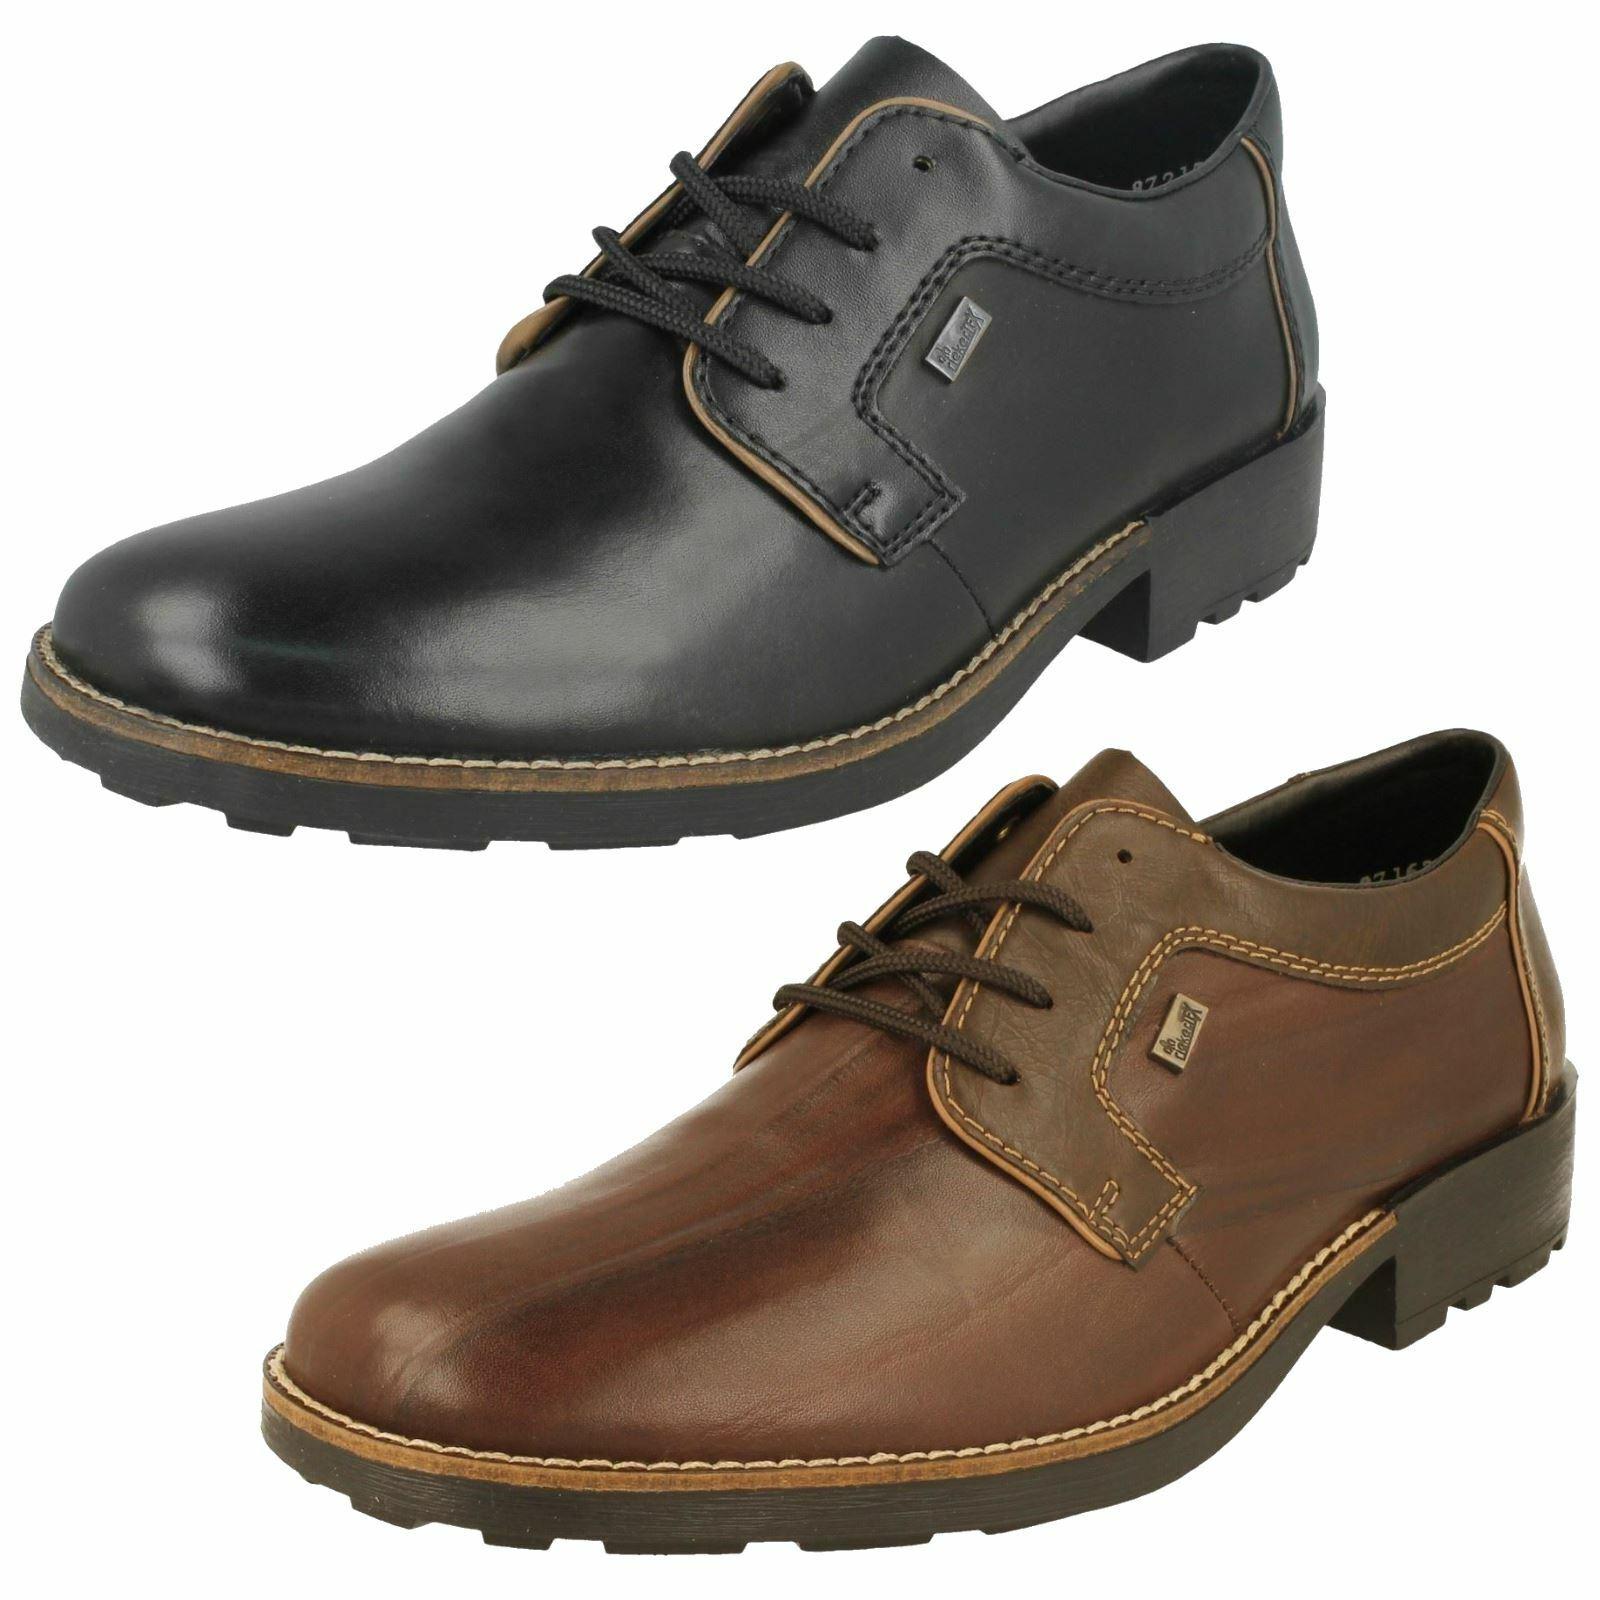 Zapatos Para Hombre Rieker formal' 16024'